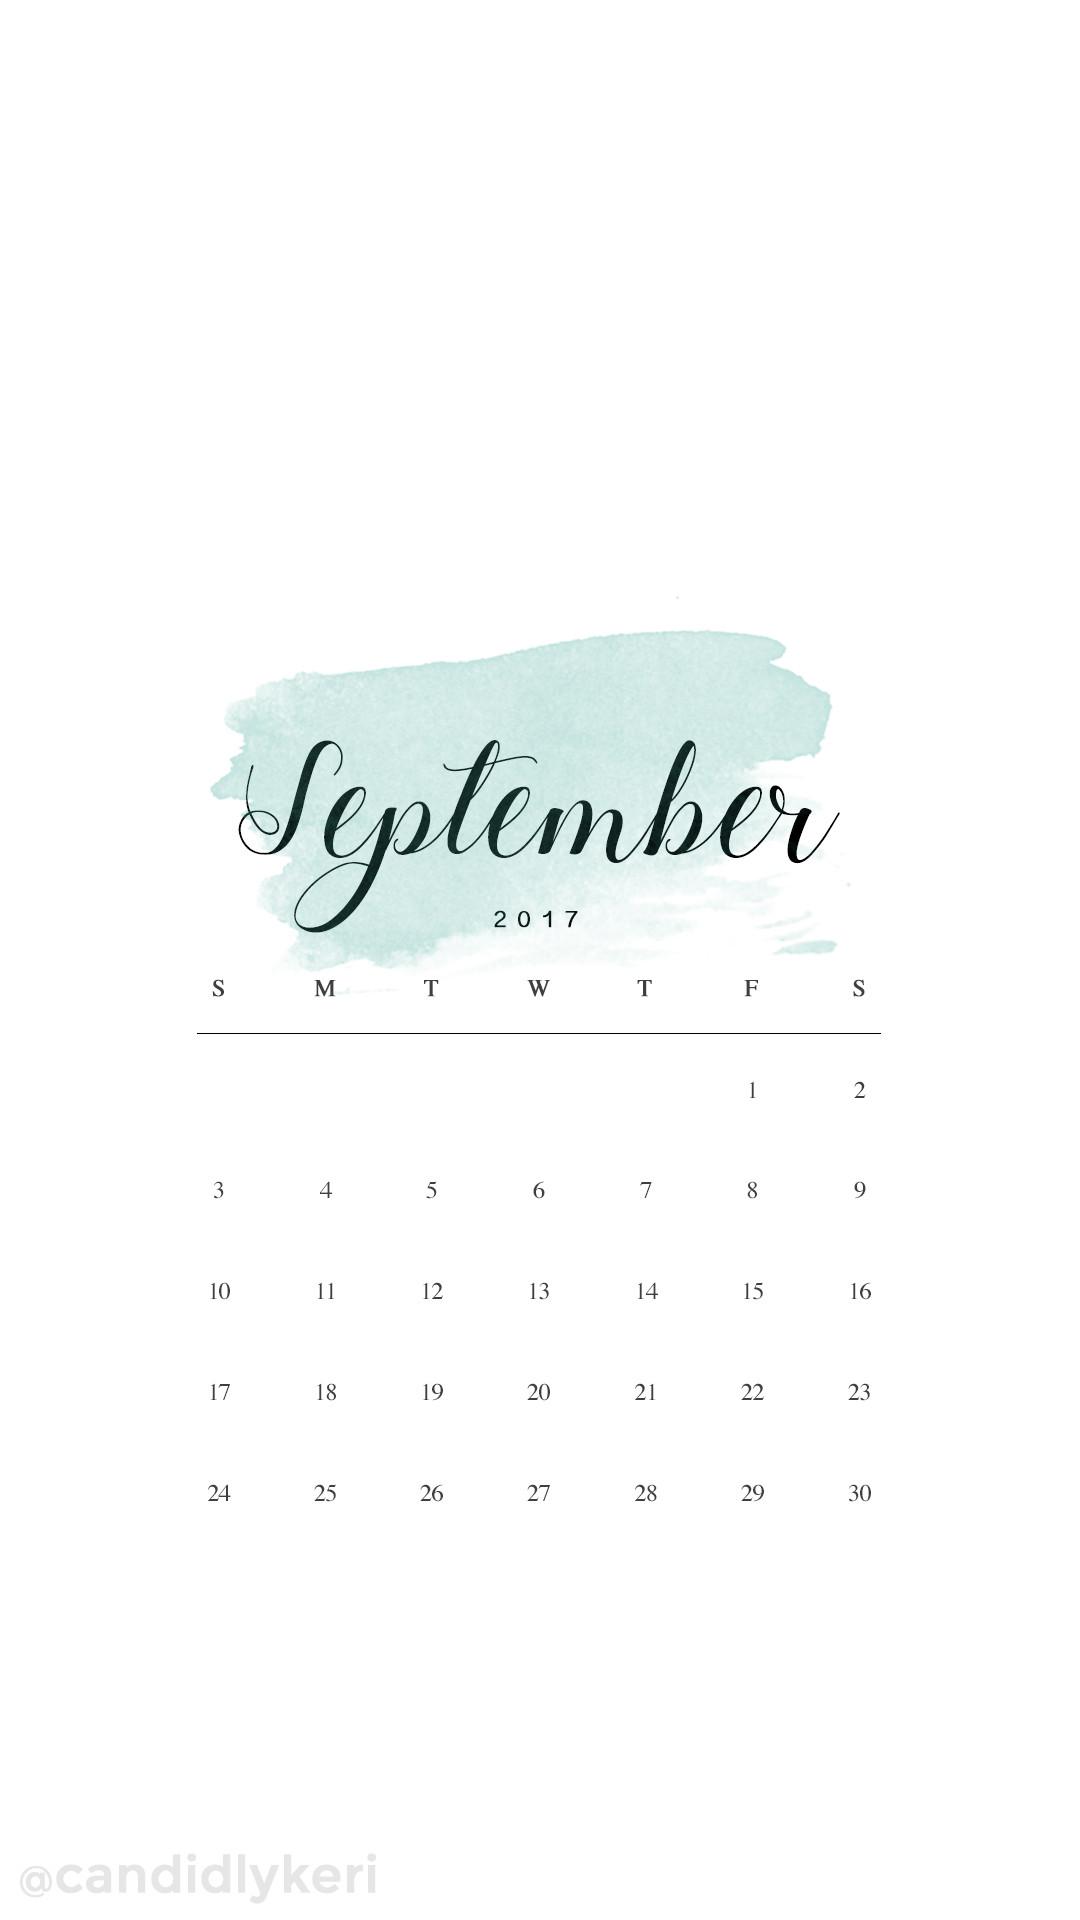 Calendar Wallpaper Ipad : Watercolor ipad desktop background calendar october